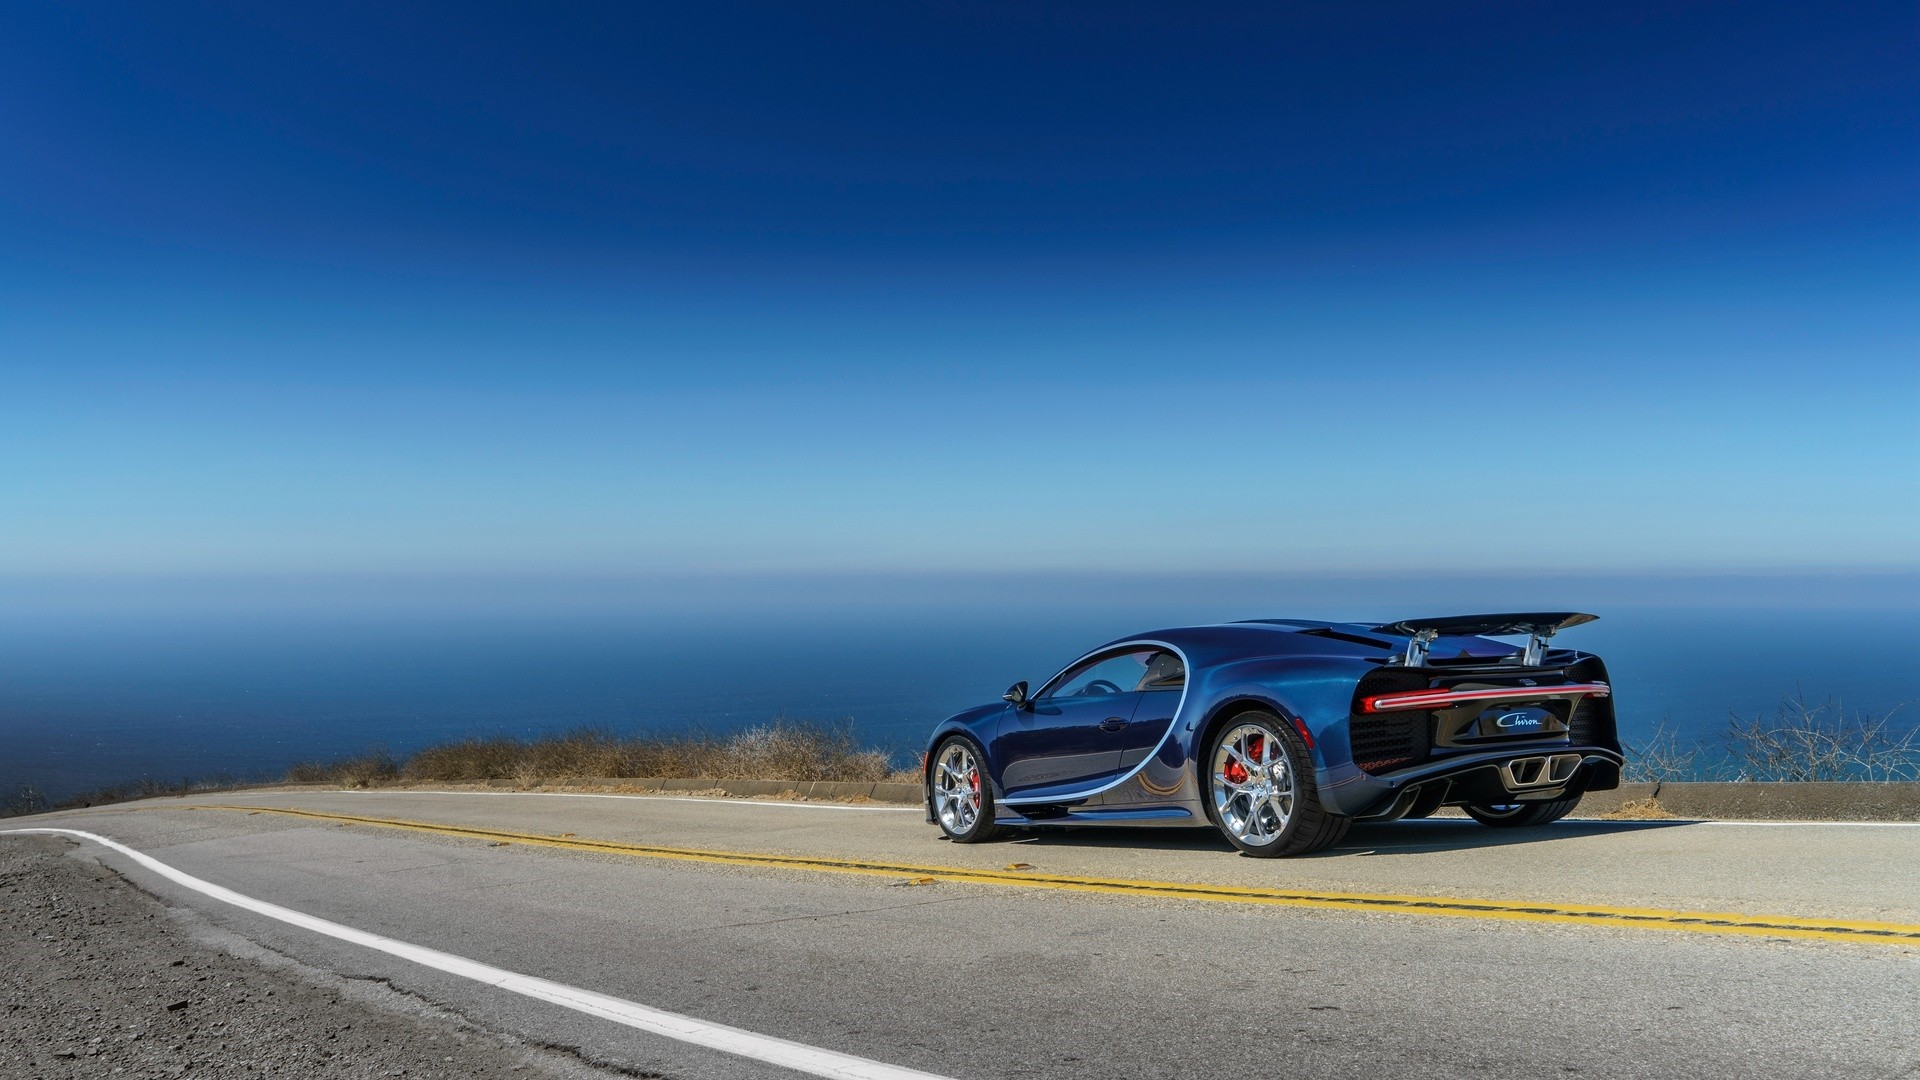 Bugatti Chiron full hd 1080p wallpaper